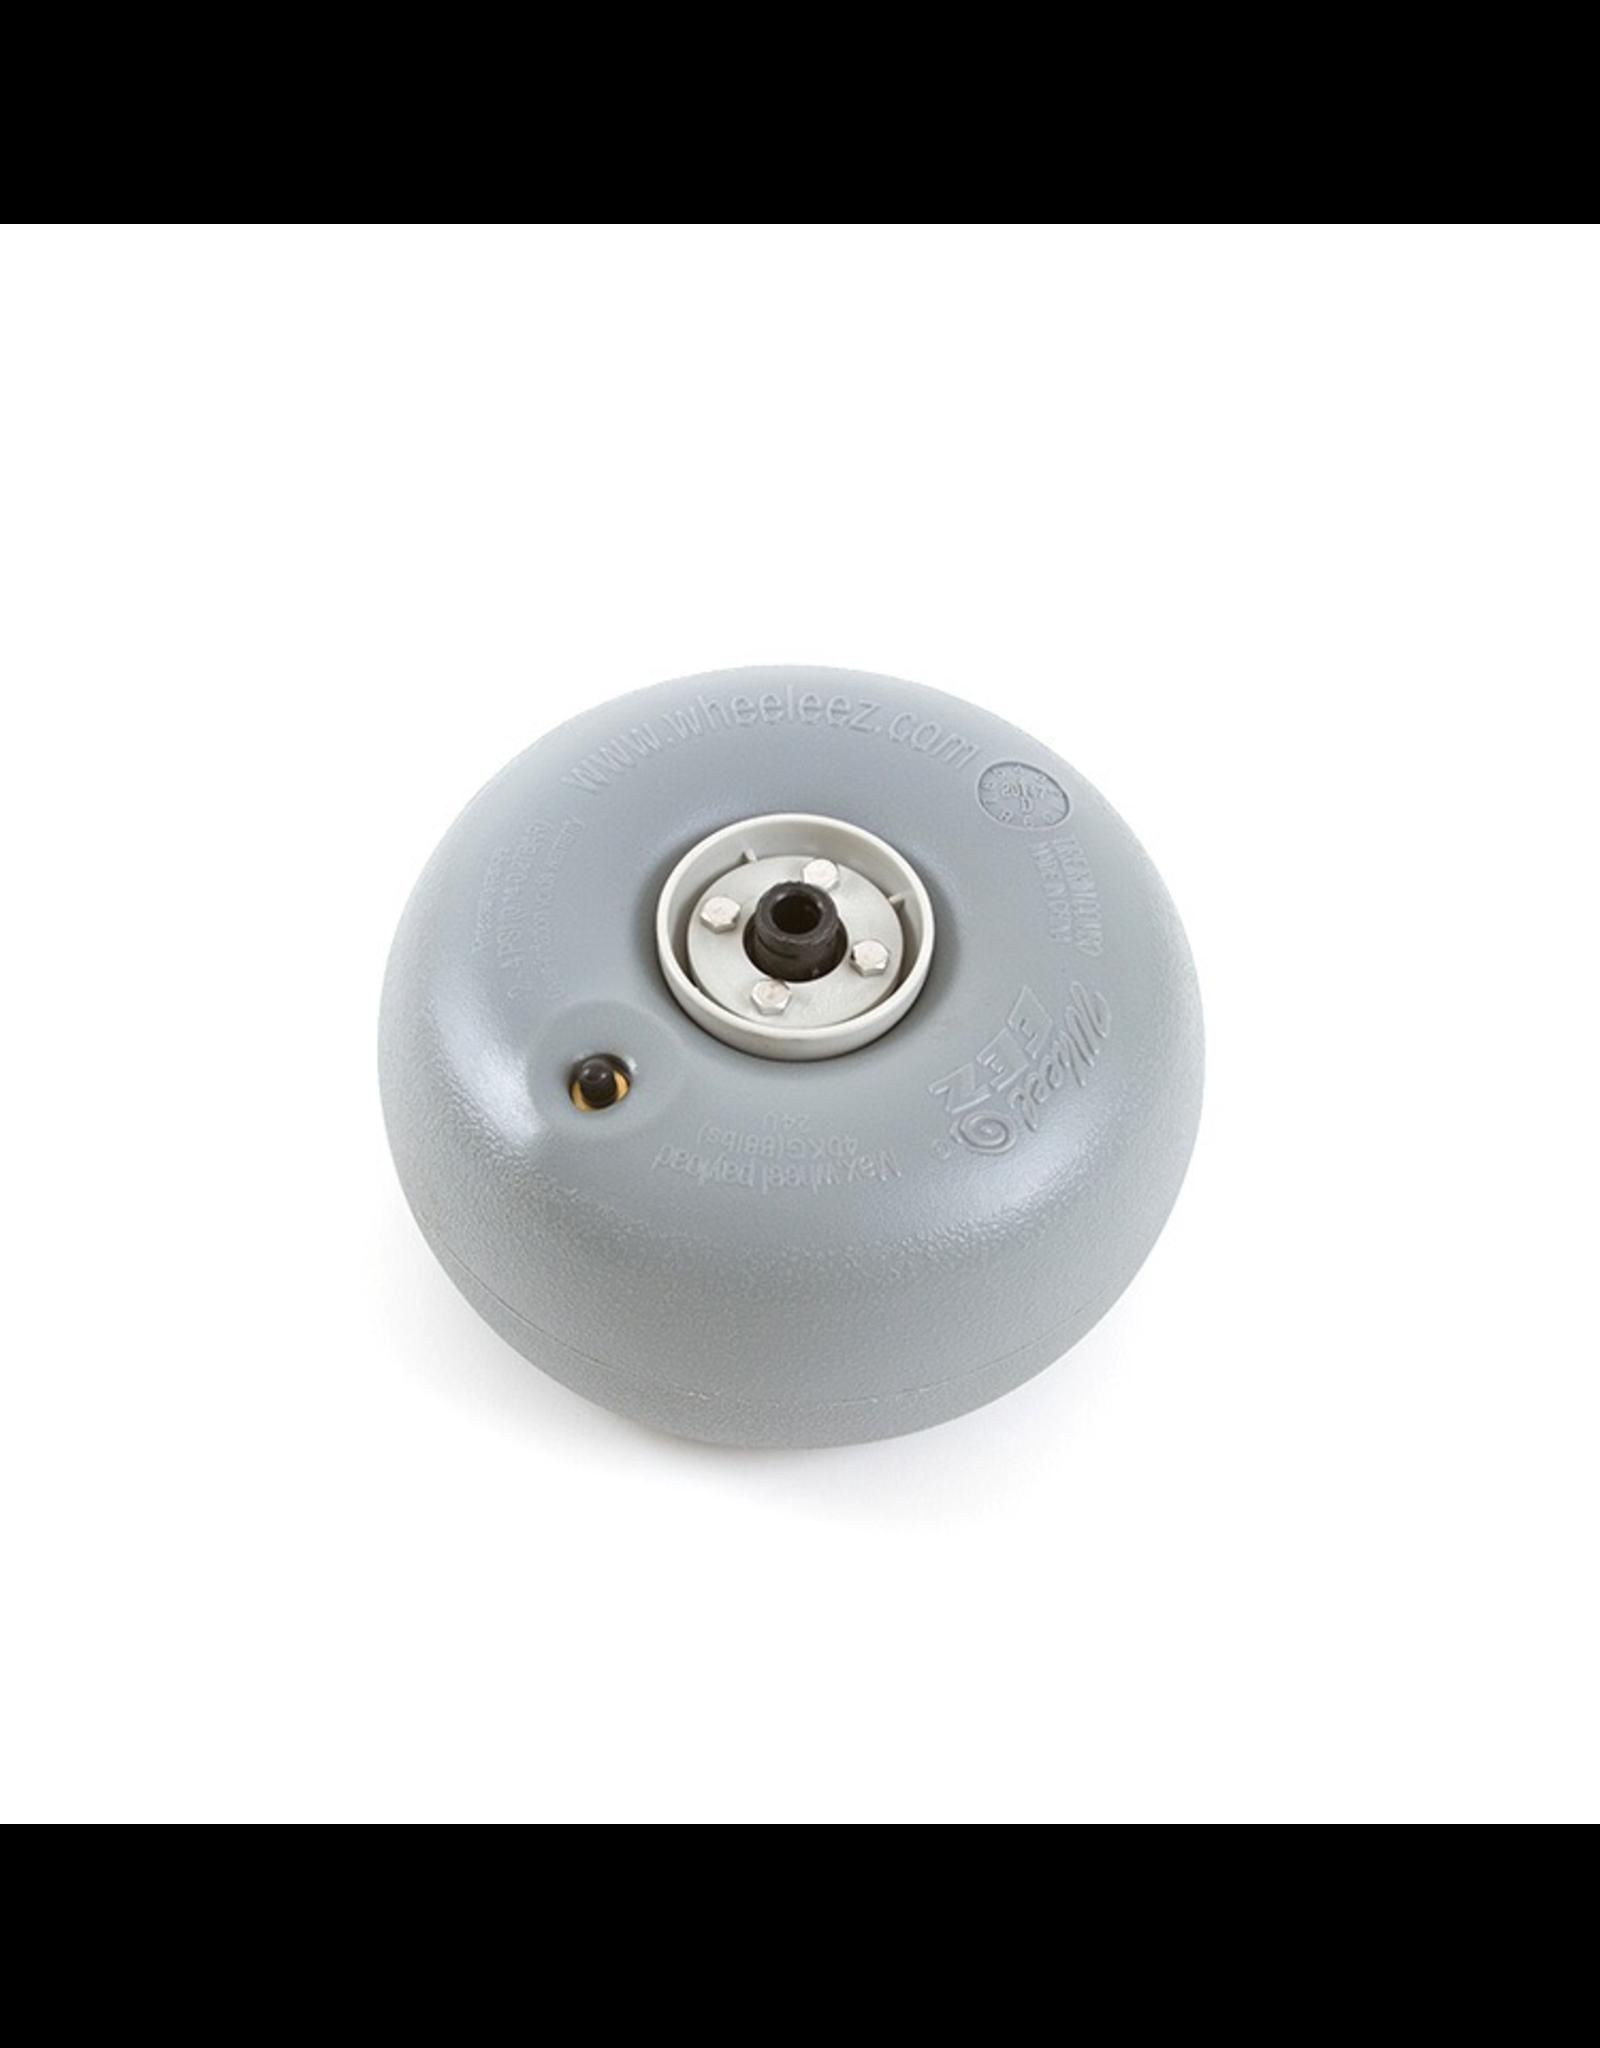 Hobie Hobie Plug-in Cart - TRAX 2 - Replacement Wheel - V2